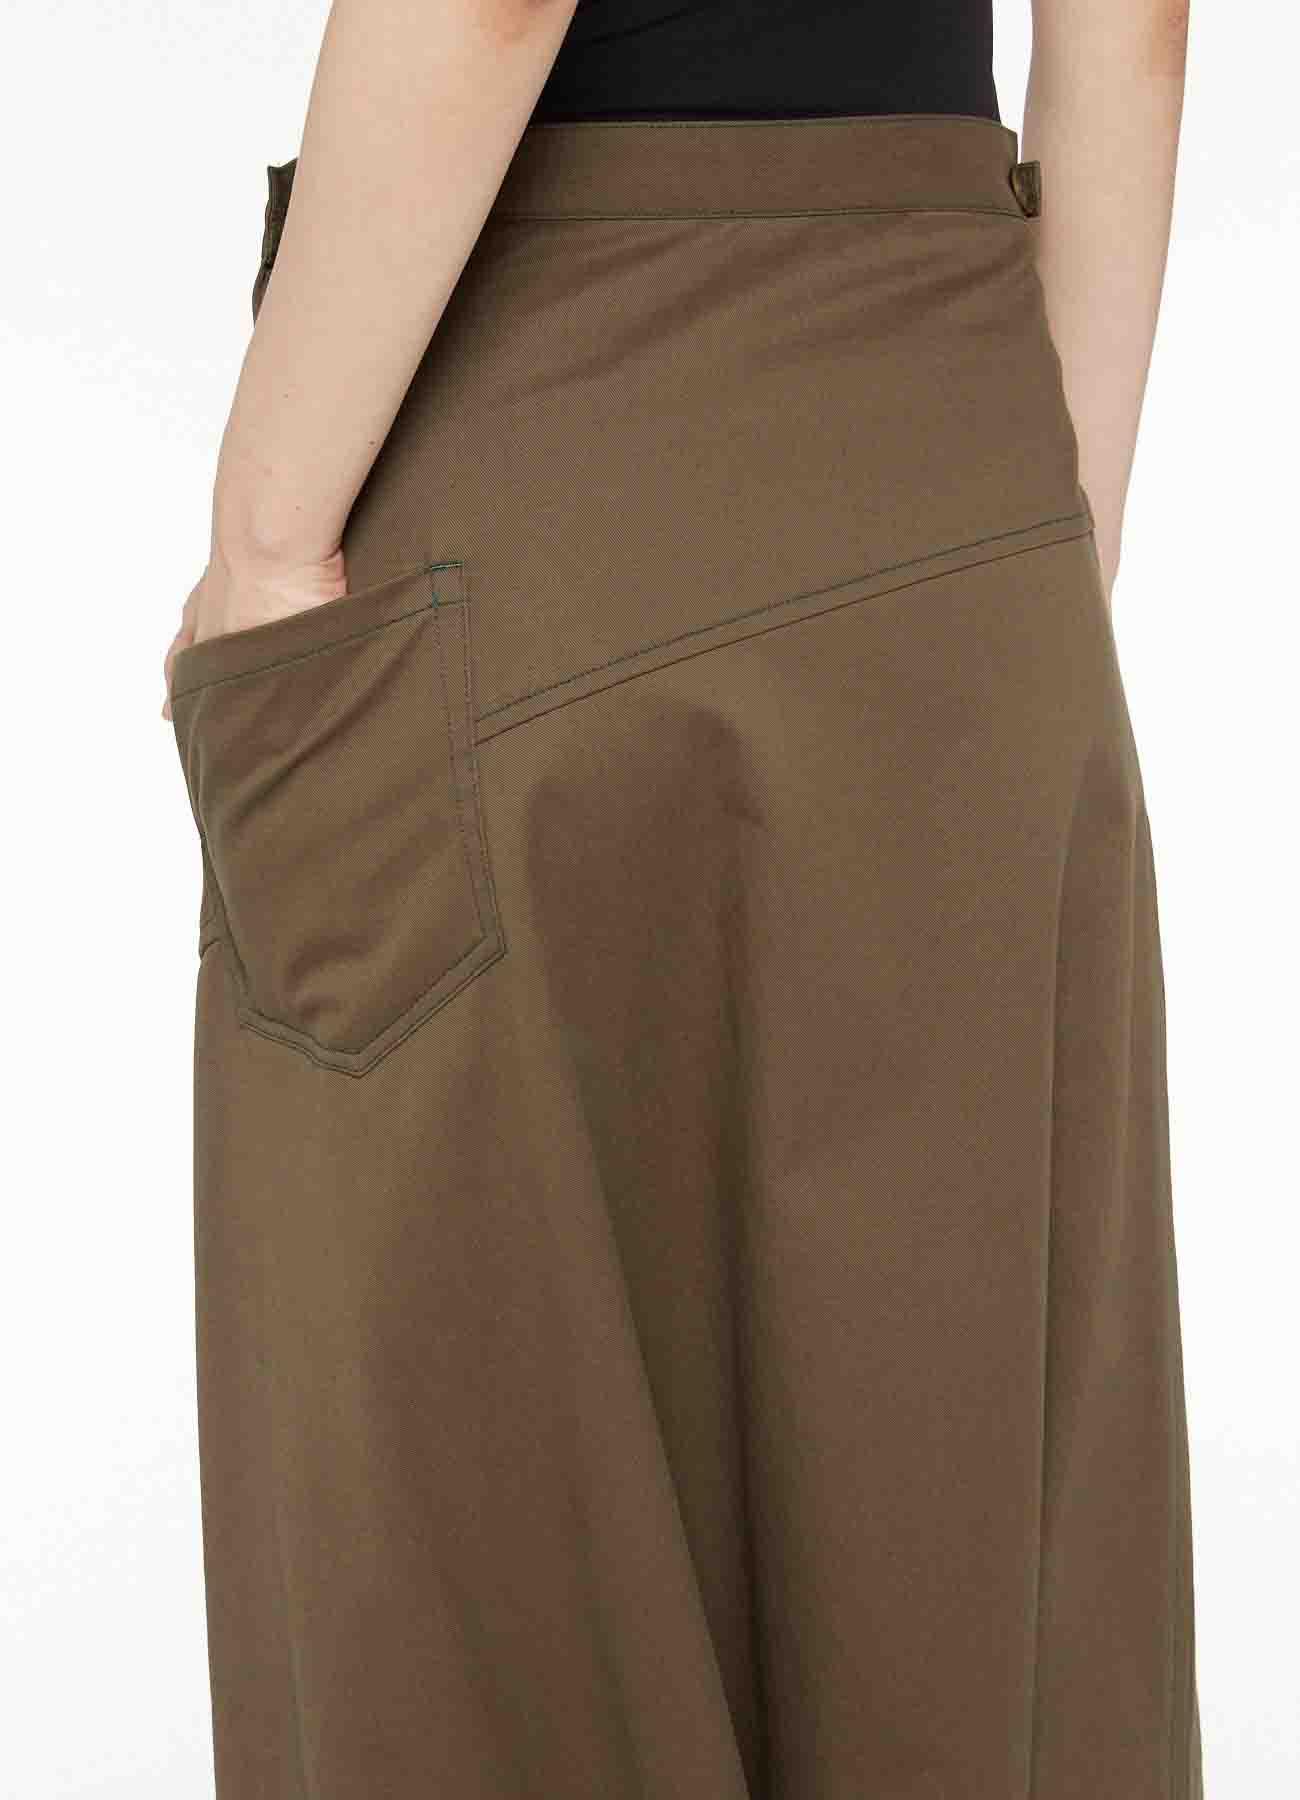 SOFT CHINO CLOTH DESINED SAROUEL PANTS